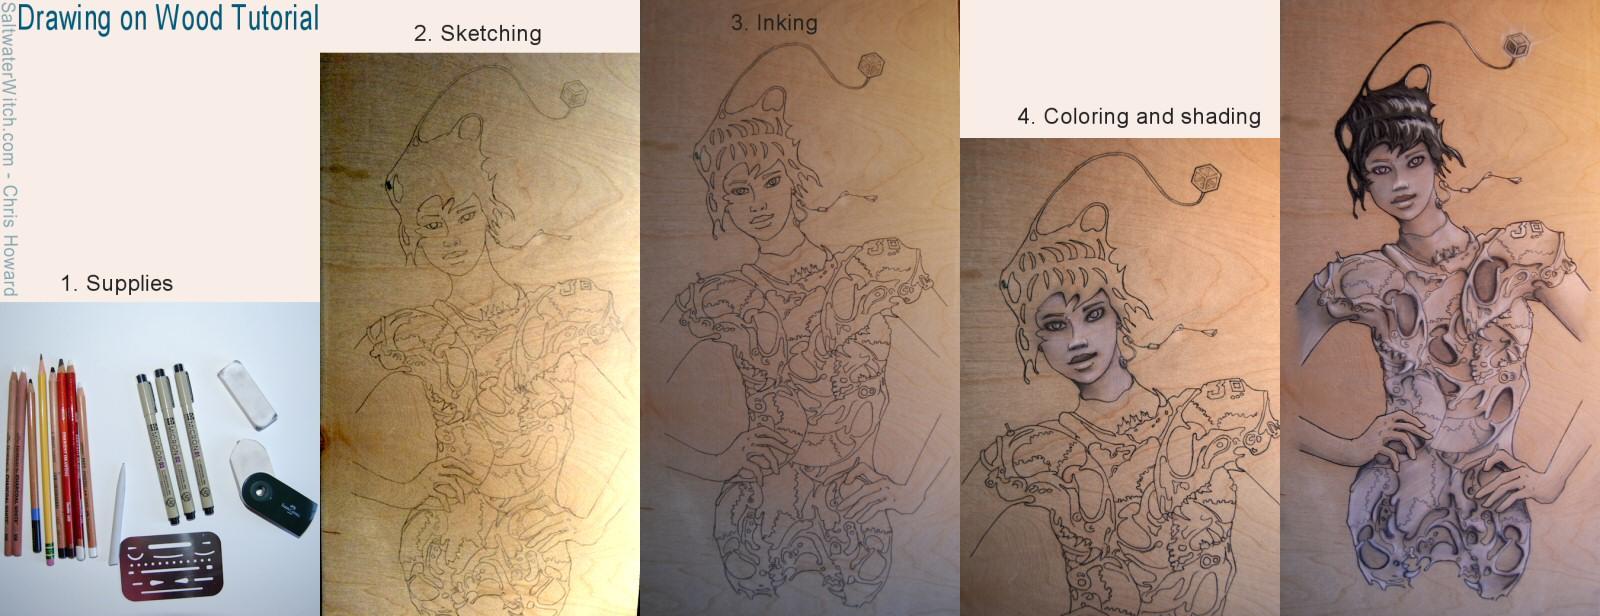 Drawing on Wood Tutorial by the0phrastus